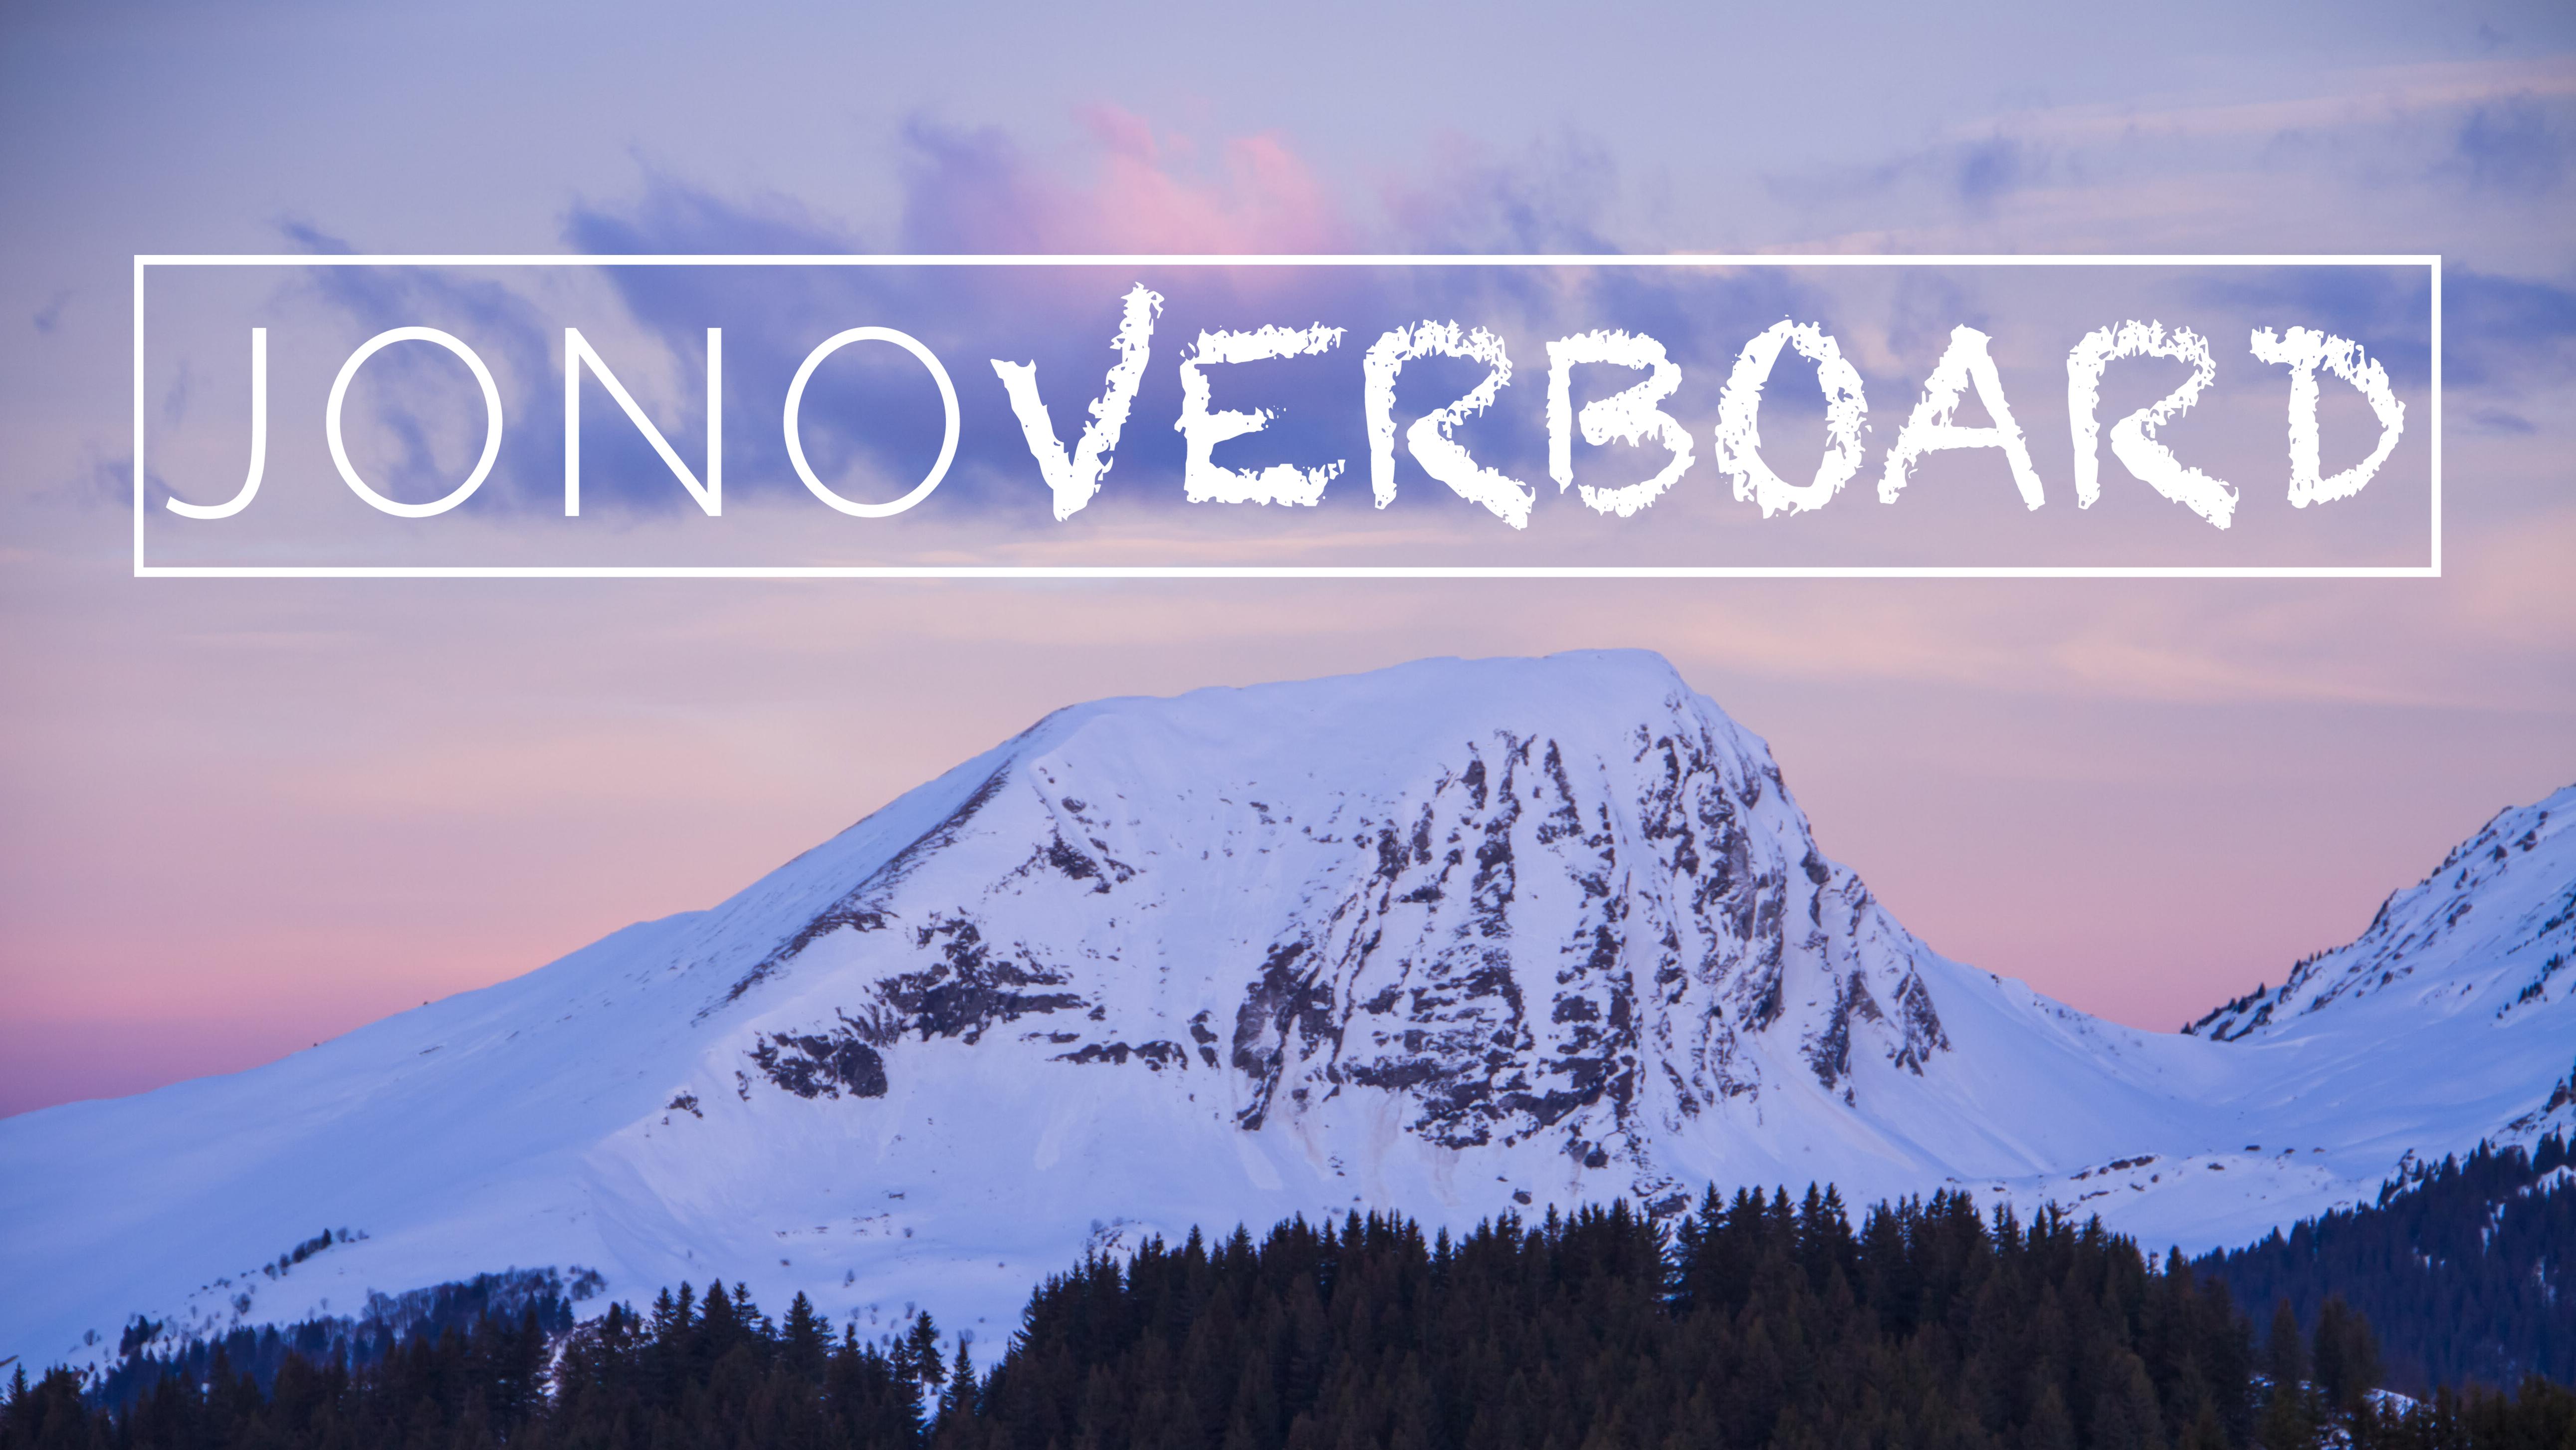 Travel Blogger | Jono Overboard - Share My Journey